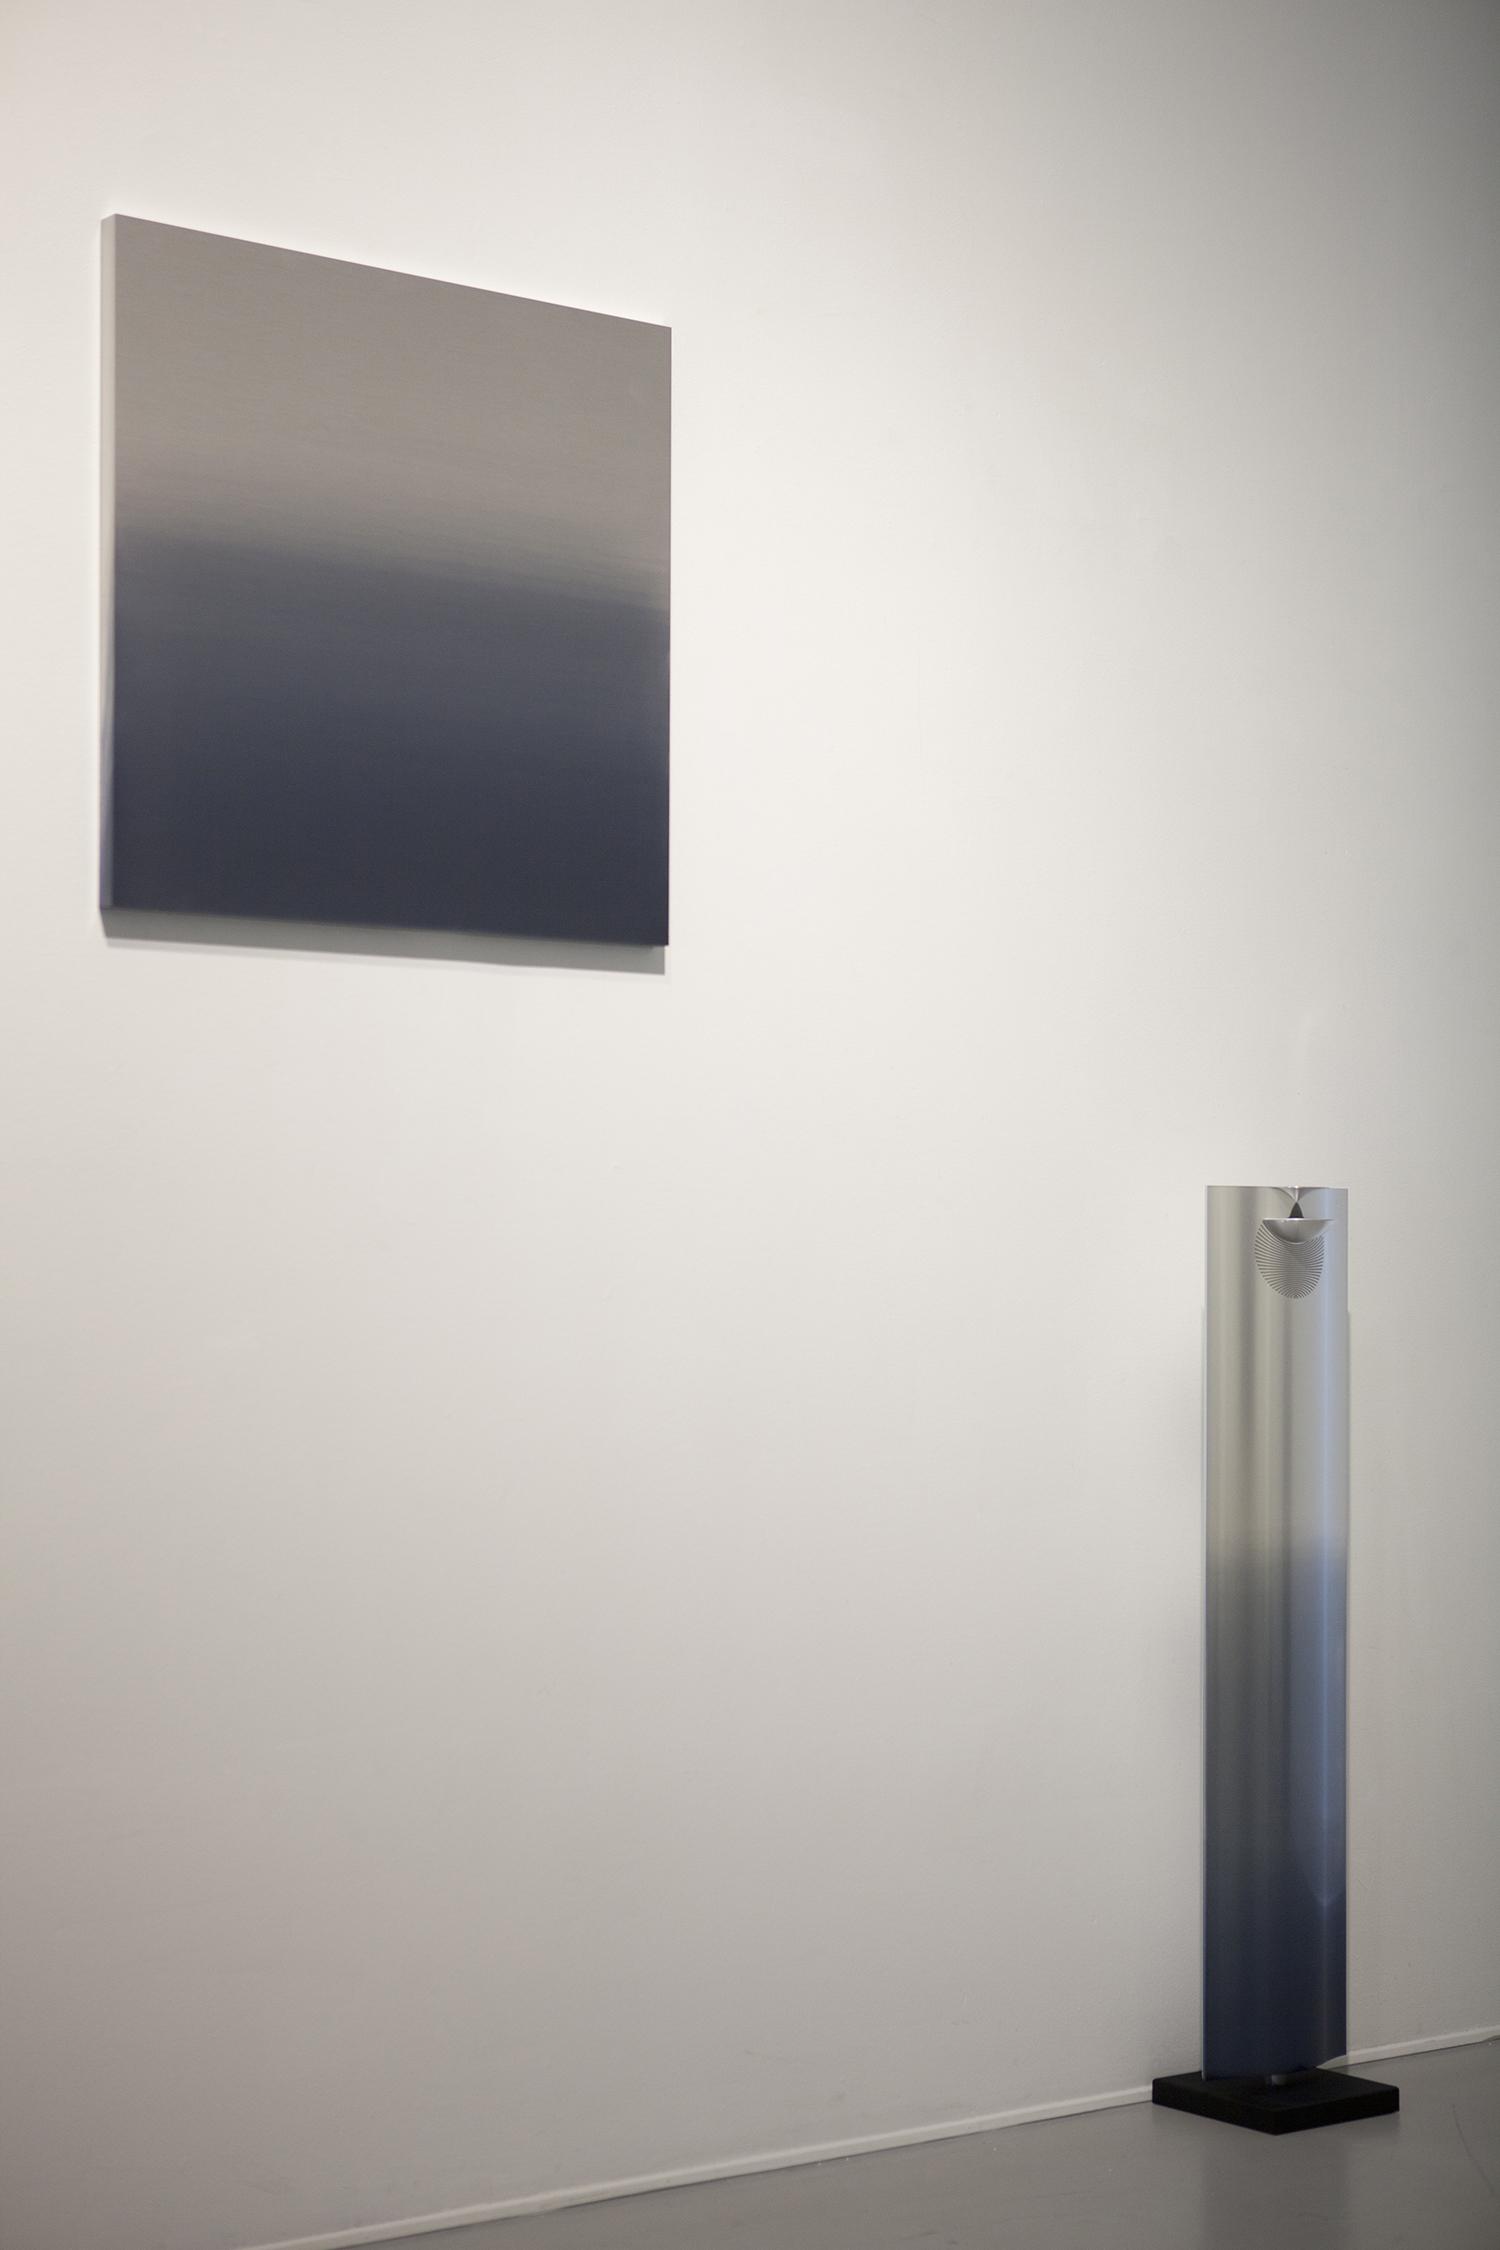 """TRANSFORMATIONS,"" MARTIN ASBAEK GALLERY & BANG OLUFSEN, COPENHAGEN, DK 2013"